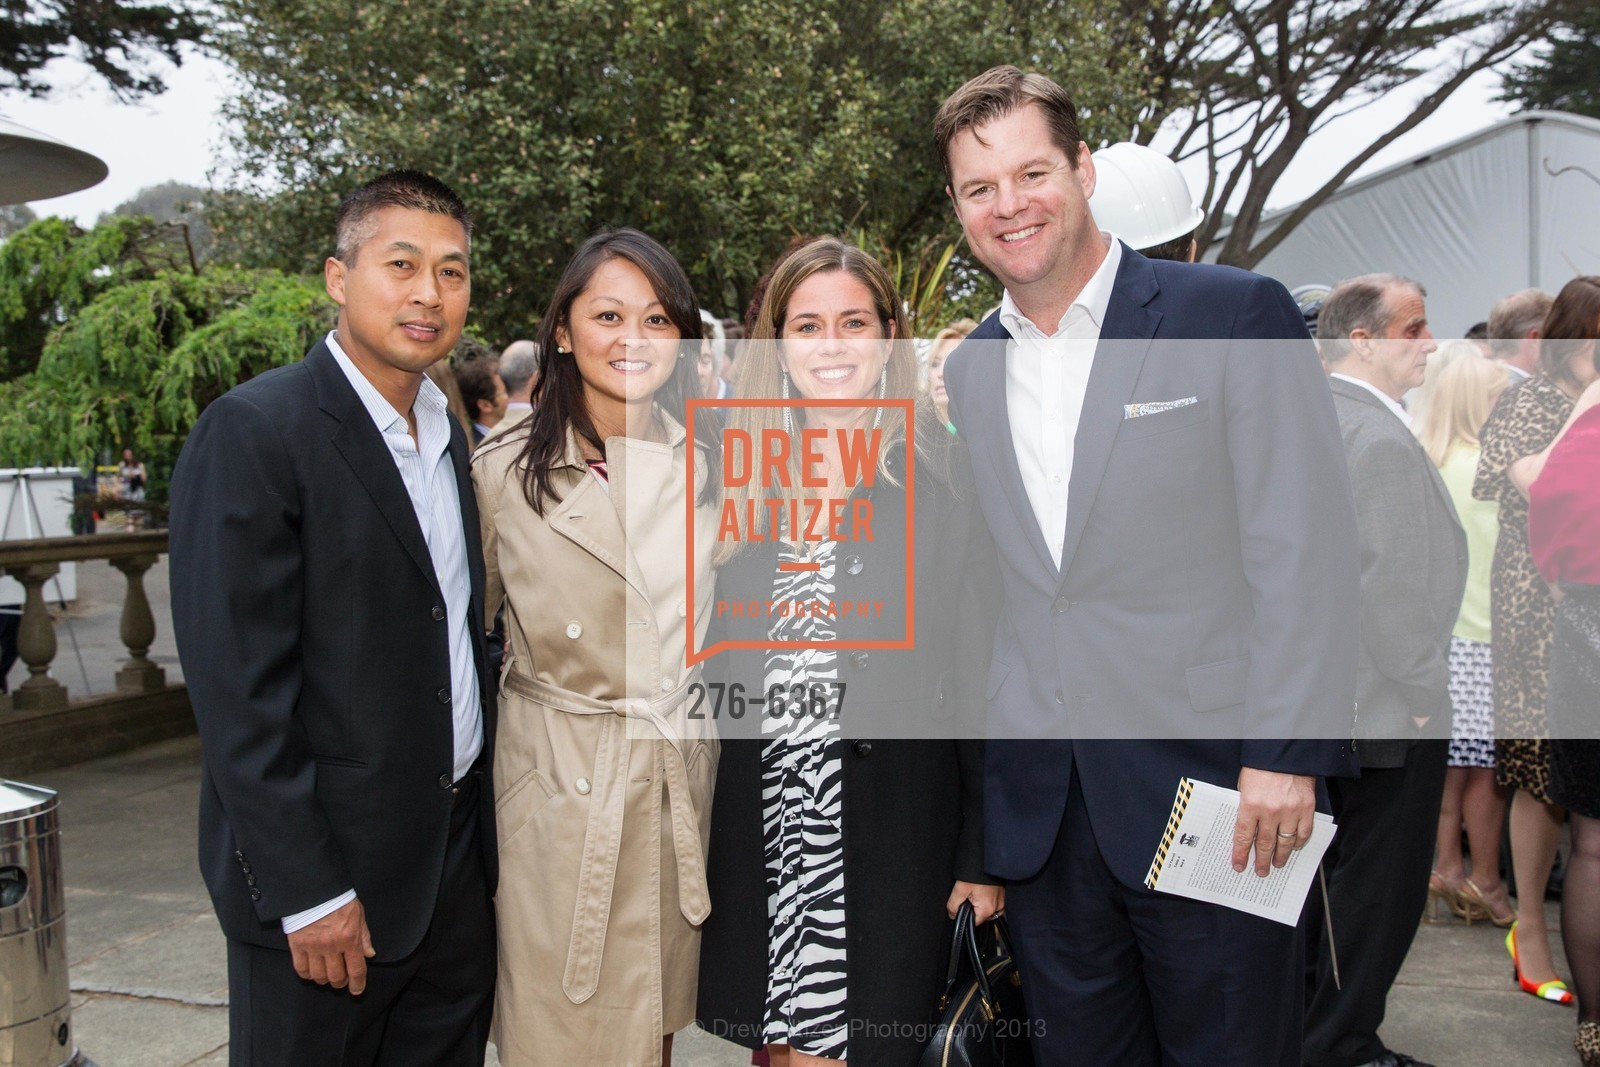 Scott Hua, Supervisor Carmen Chu, Liz Farrell, Supervisor Mark Farrell, ZooFest 2013 Hard Hat & Tails, US, May 11th, 2013